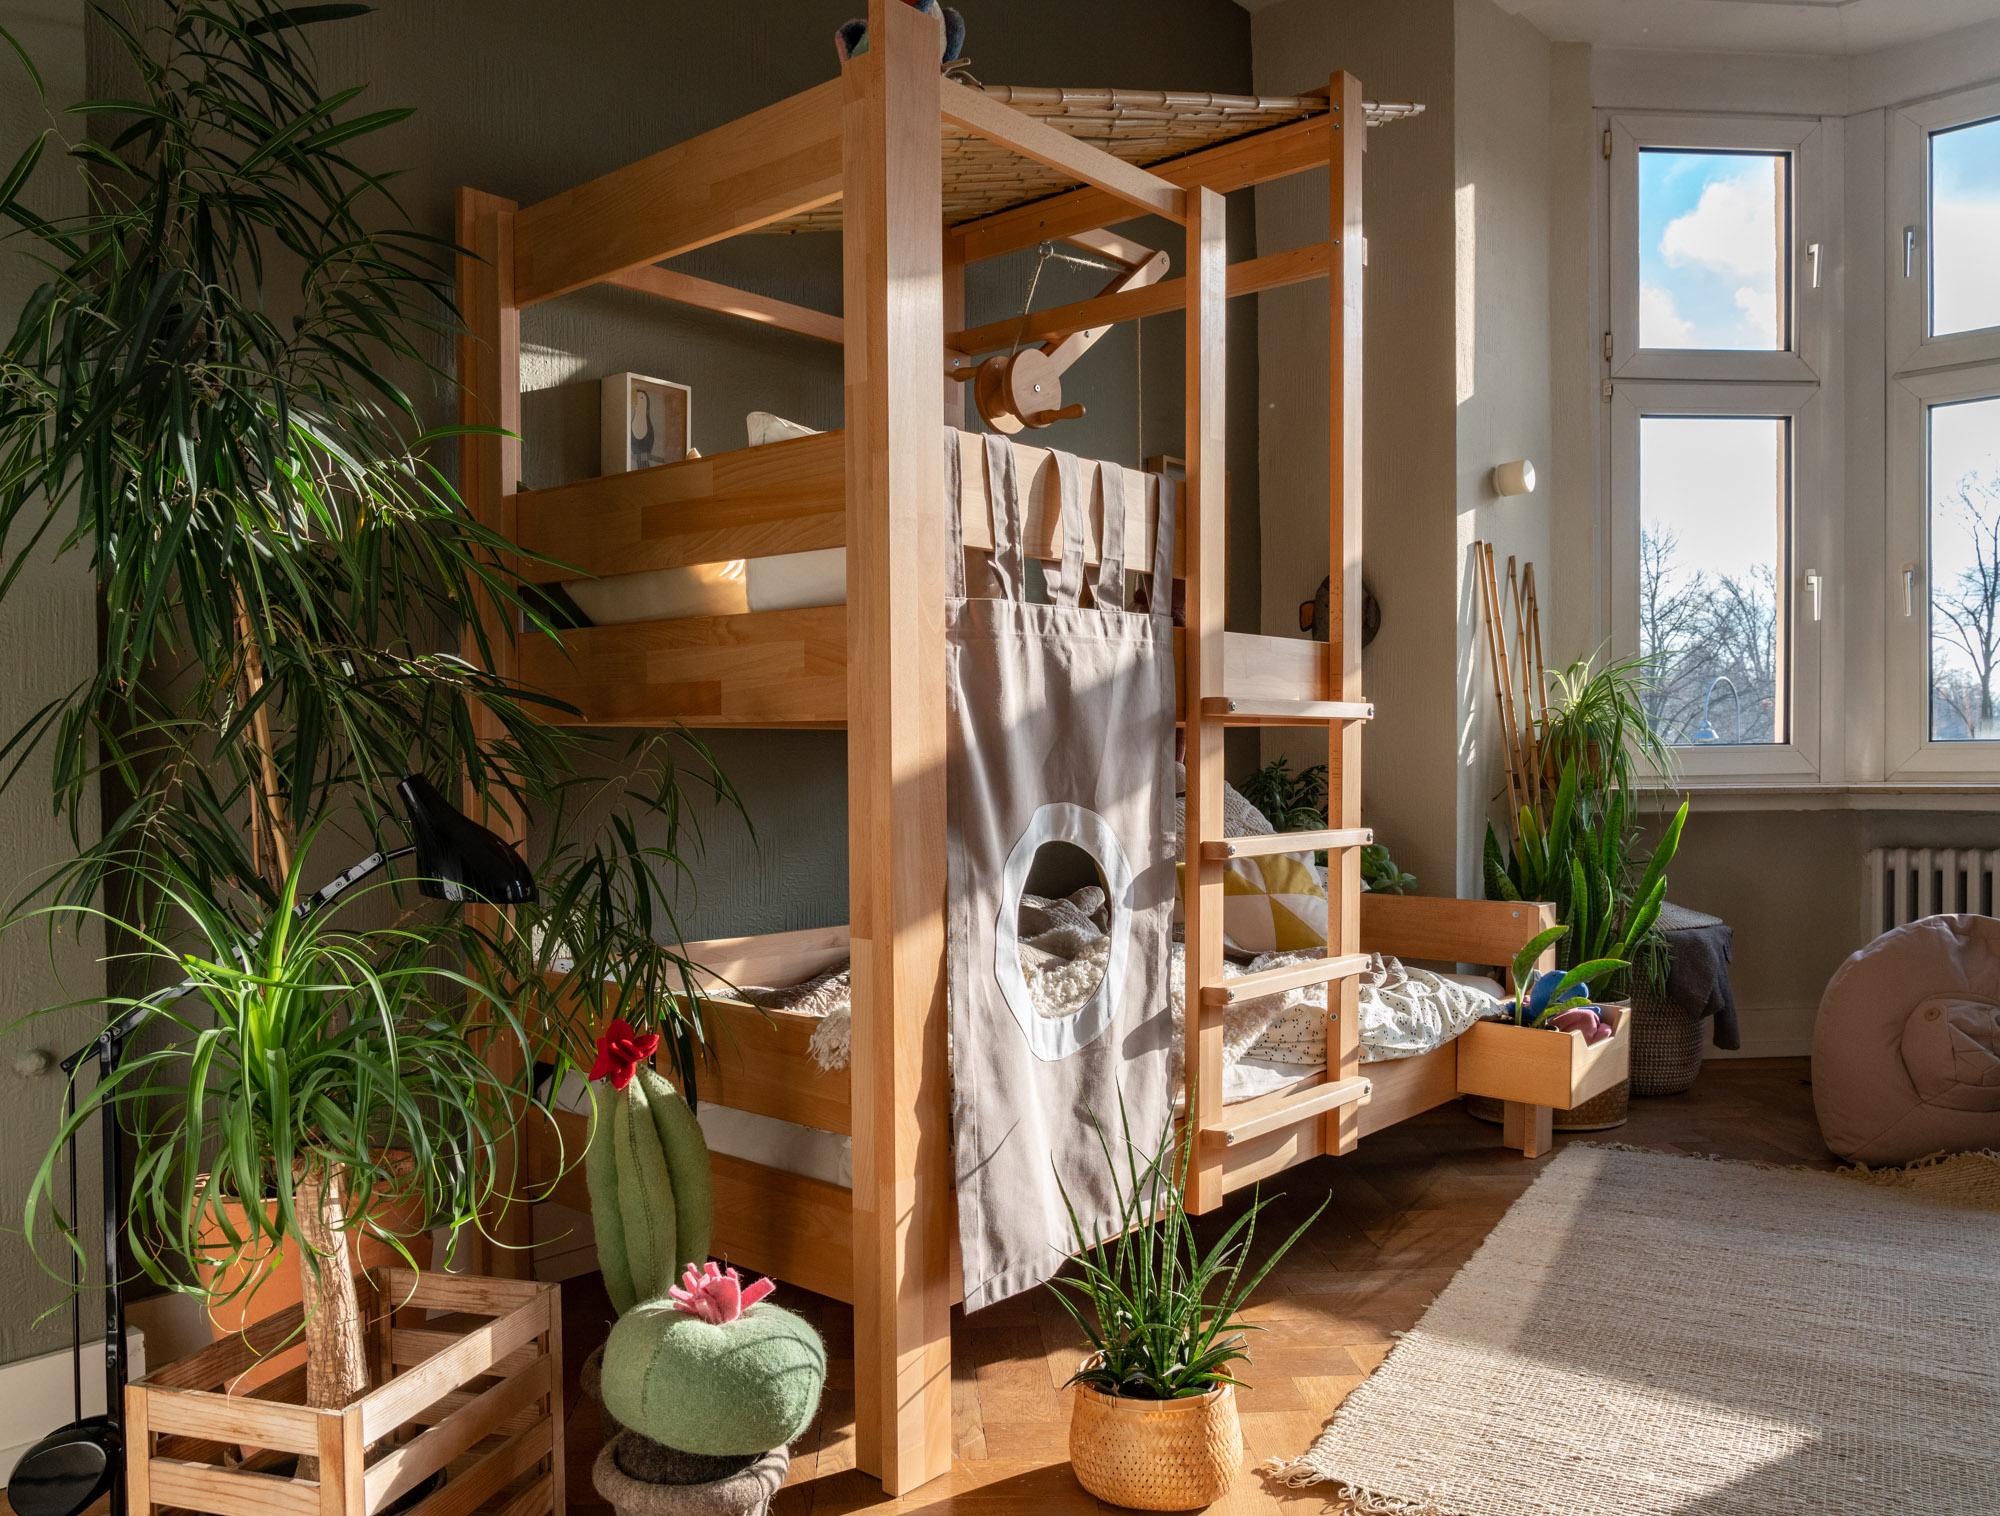 Baumhausbett natur Raumansicht